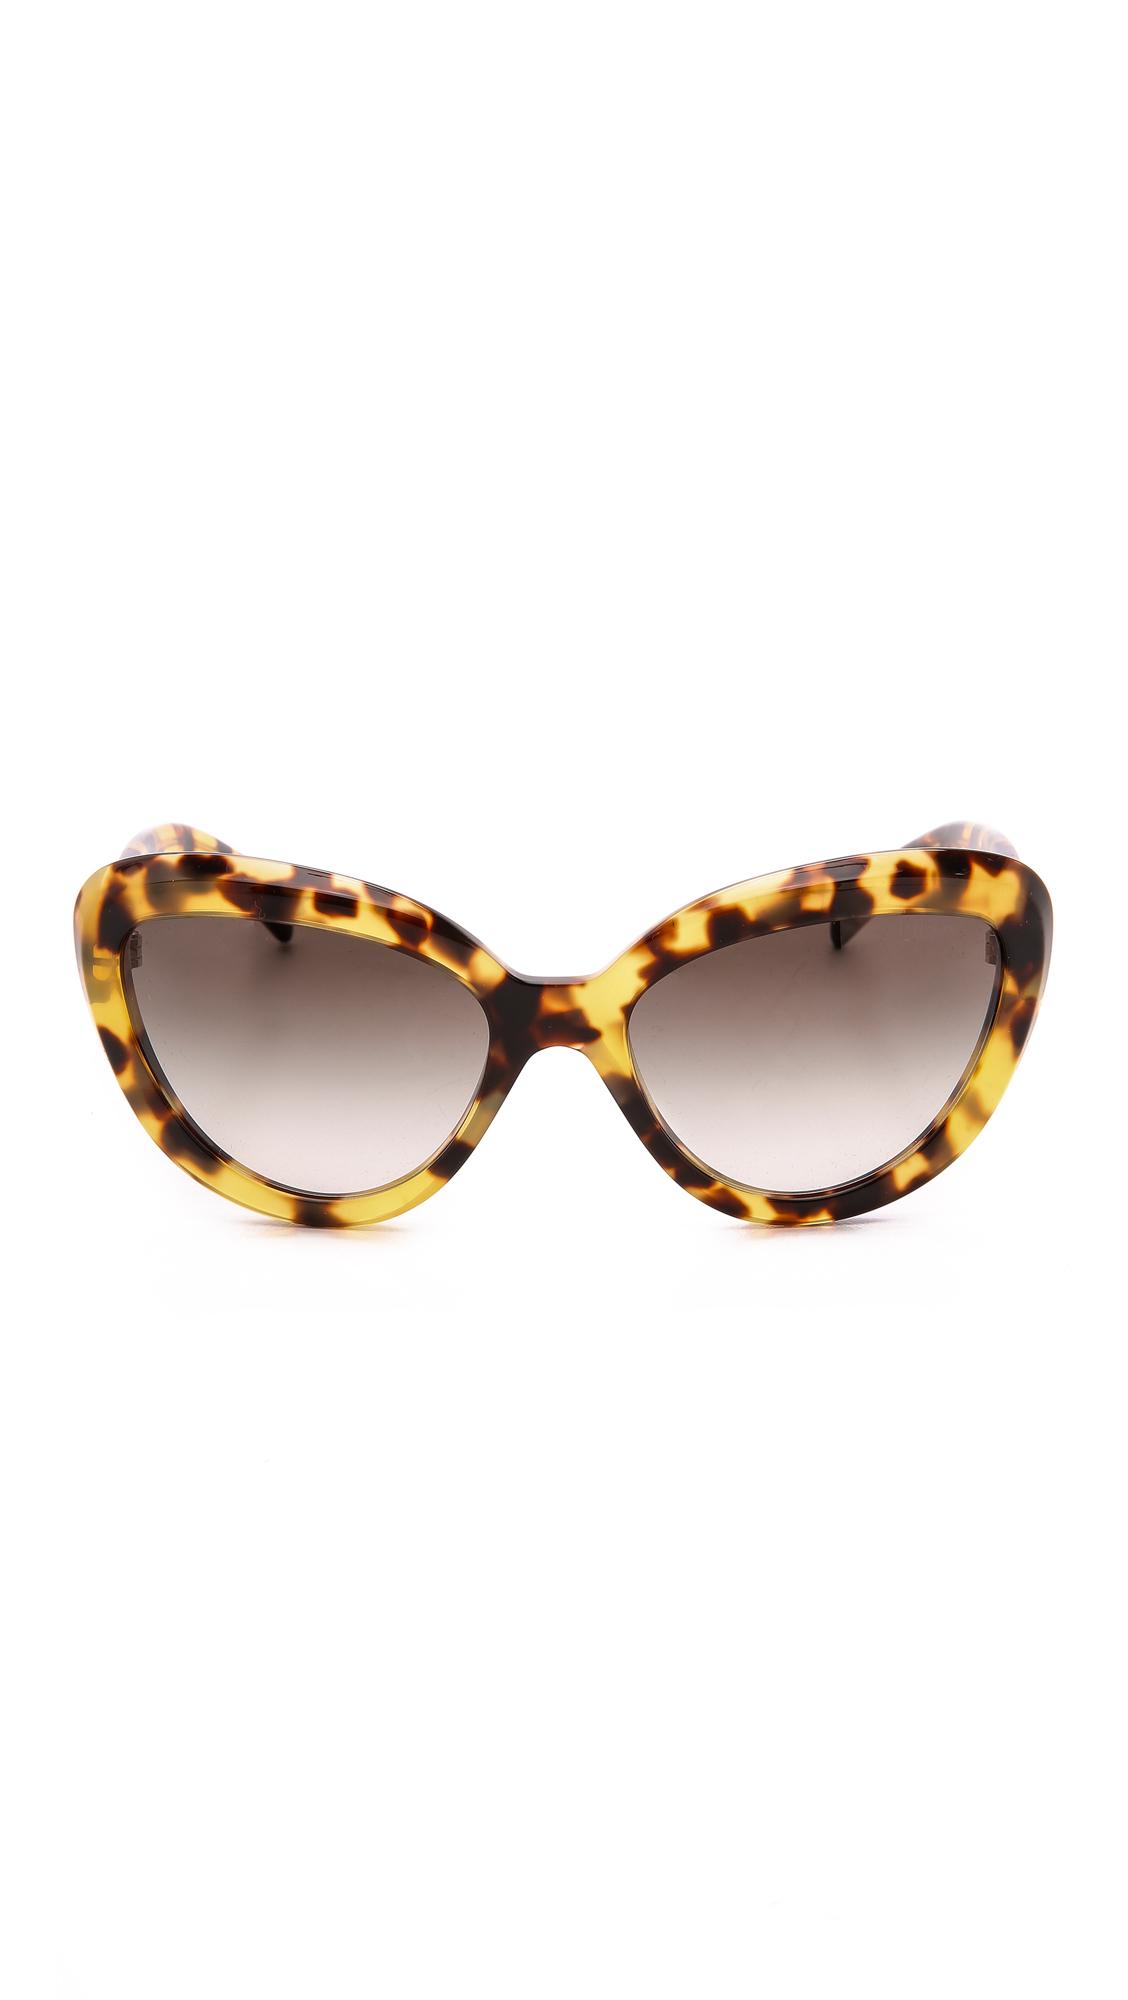 Prada Cat Eye Sunglasses - Havana/brown